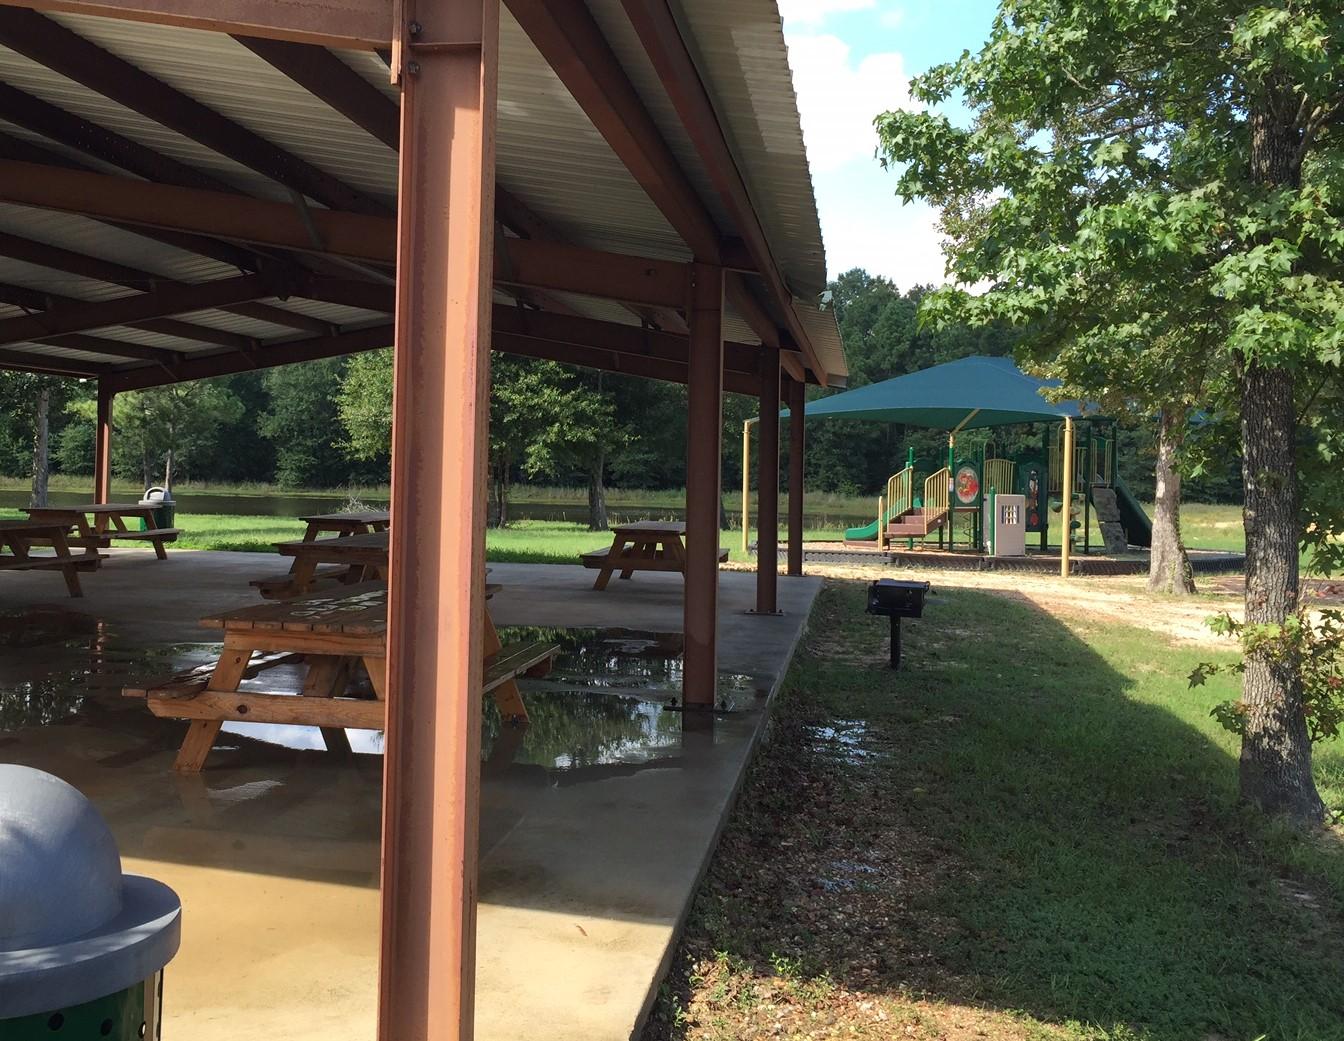 Grant Lake Park - 4231 N Duck Creek Rd. thumbnail